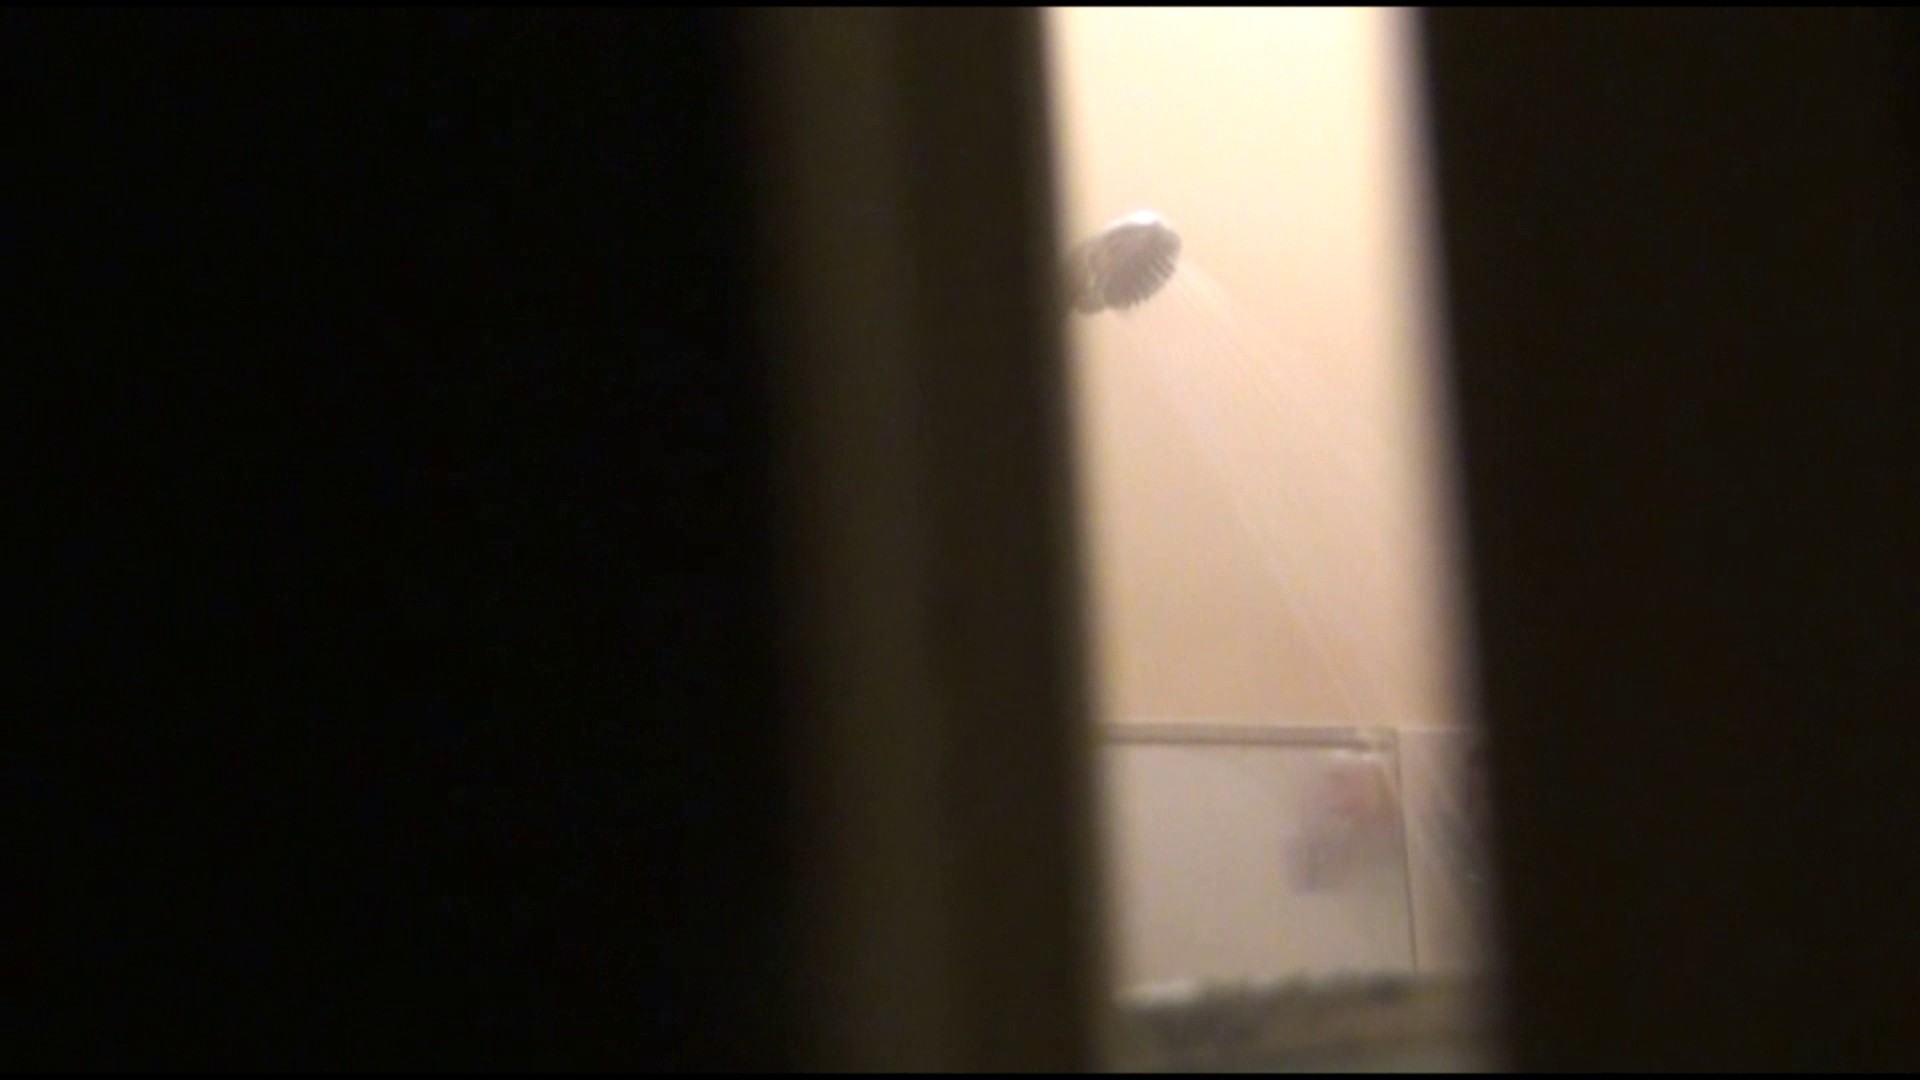 vol.08最高のパイラインを流れるシャワーの水が極上嬢をさらに引き立てます! ギャル攻め われめAV動画紹介 78画像 2